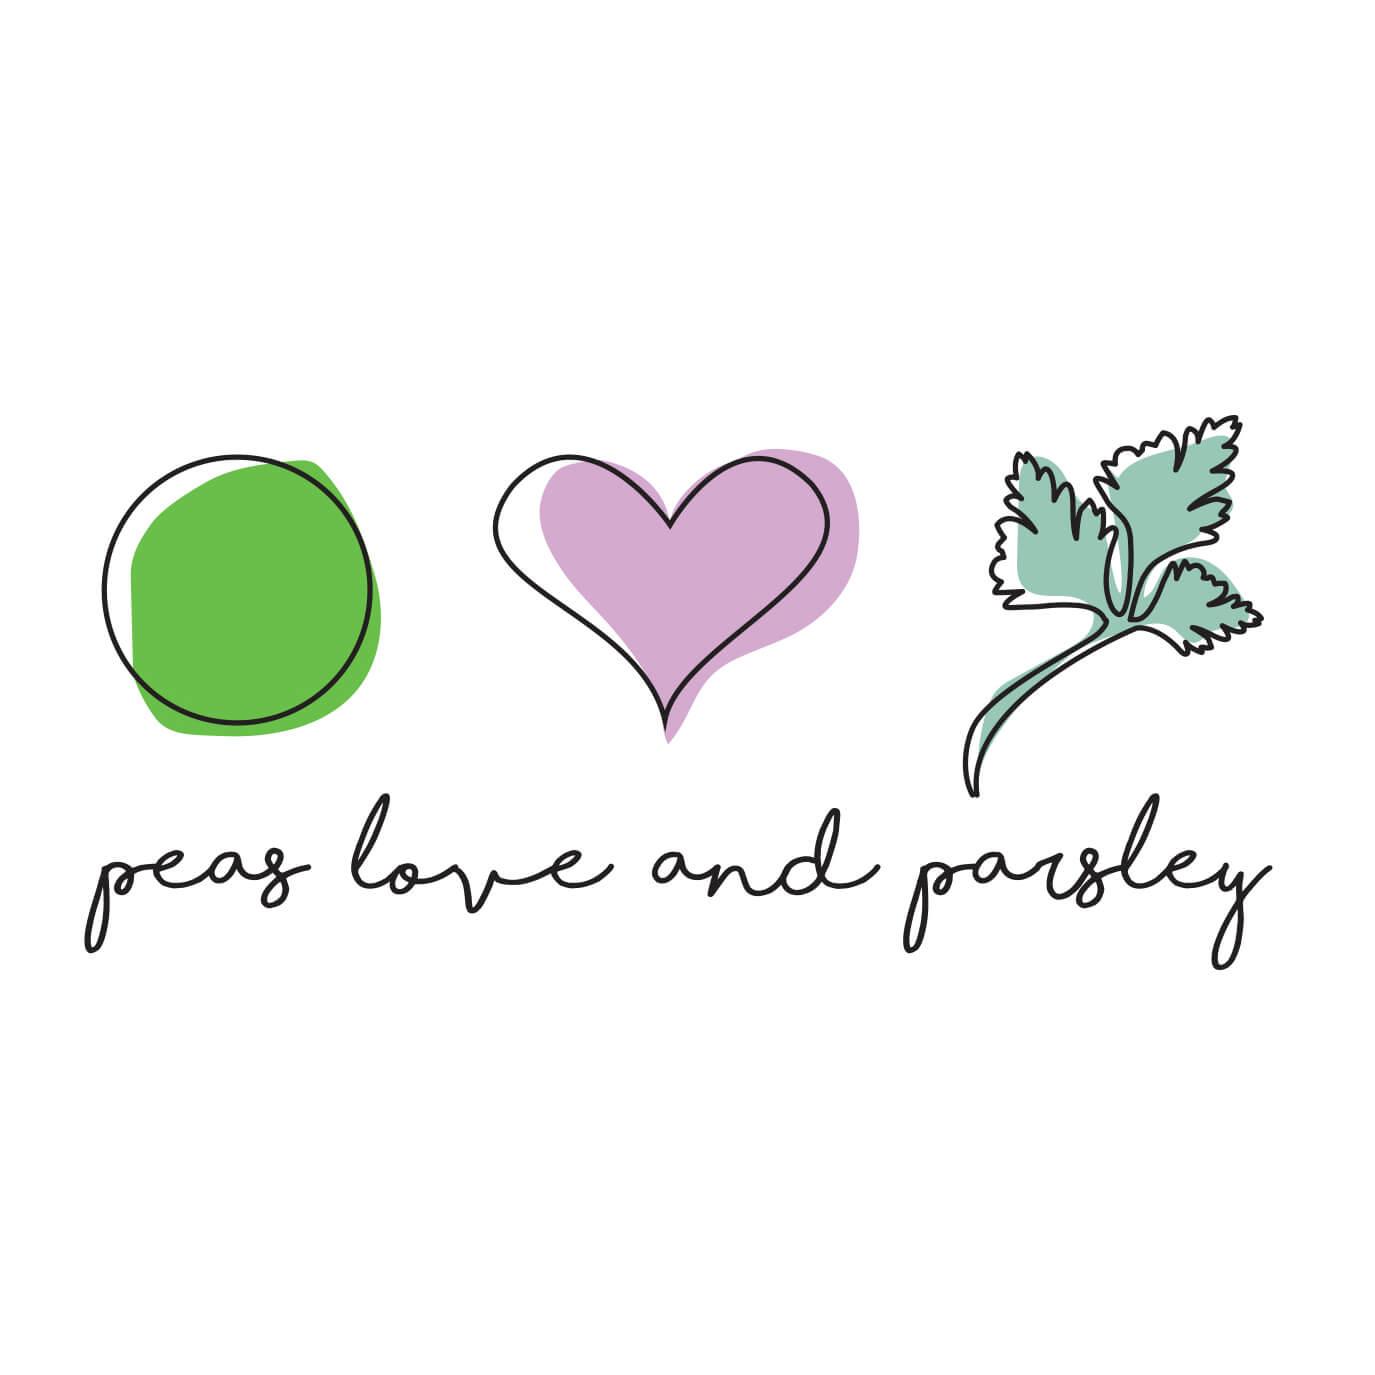 Peas Love and Parsley Logo